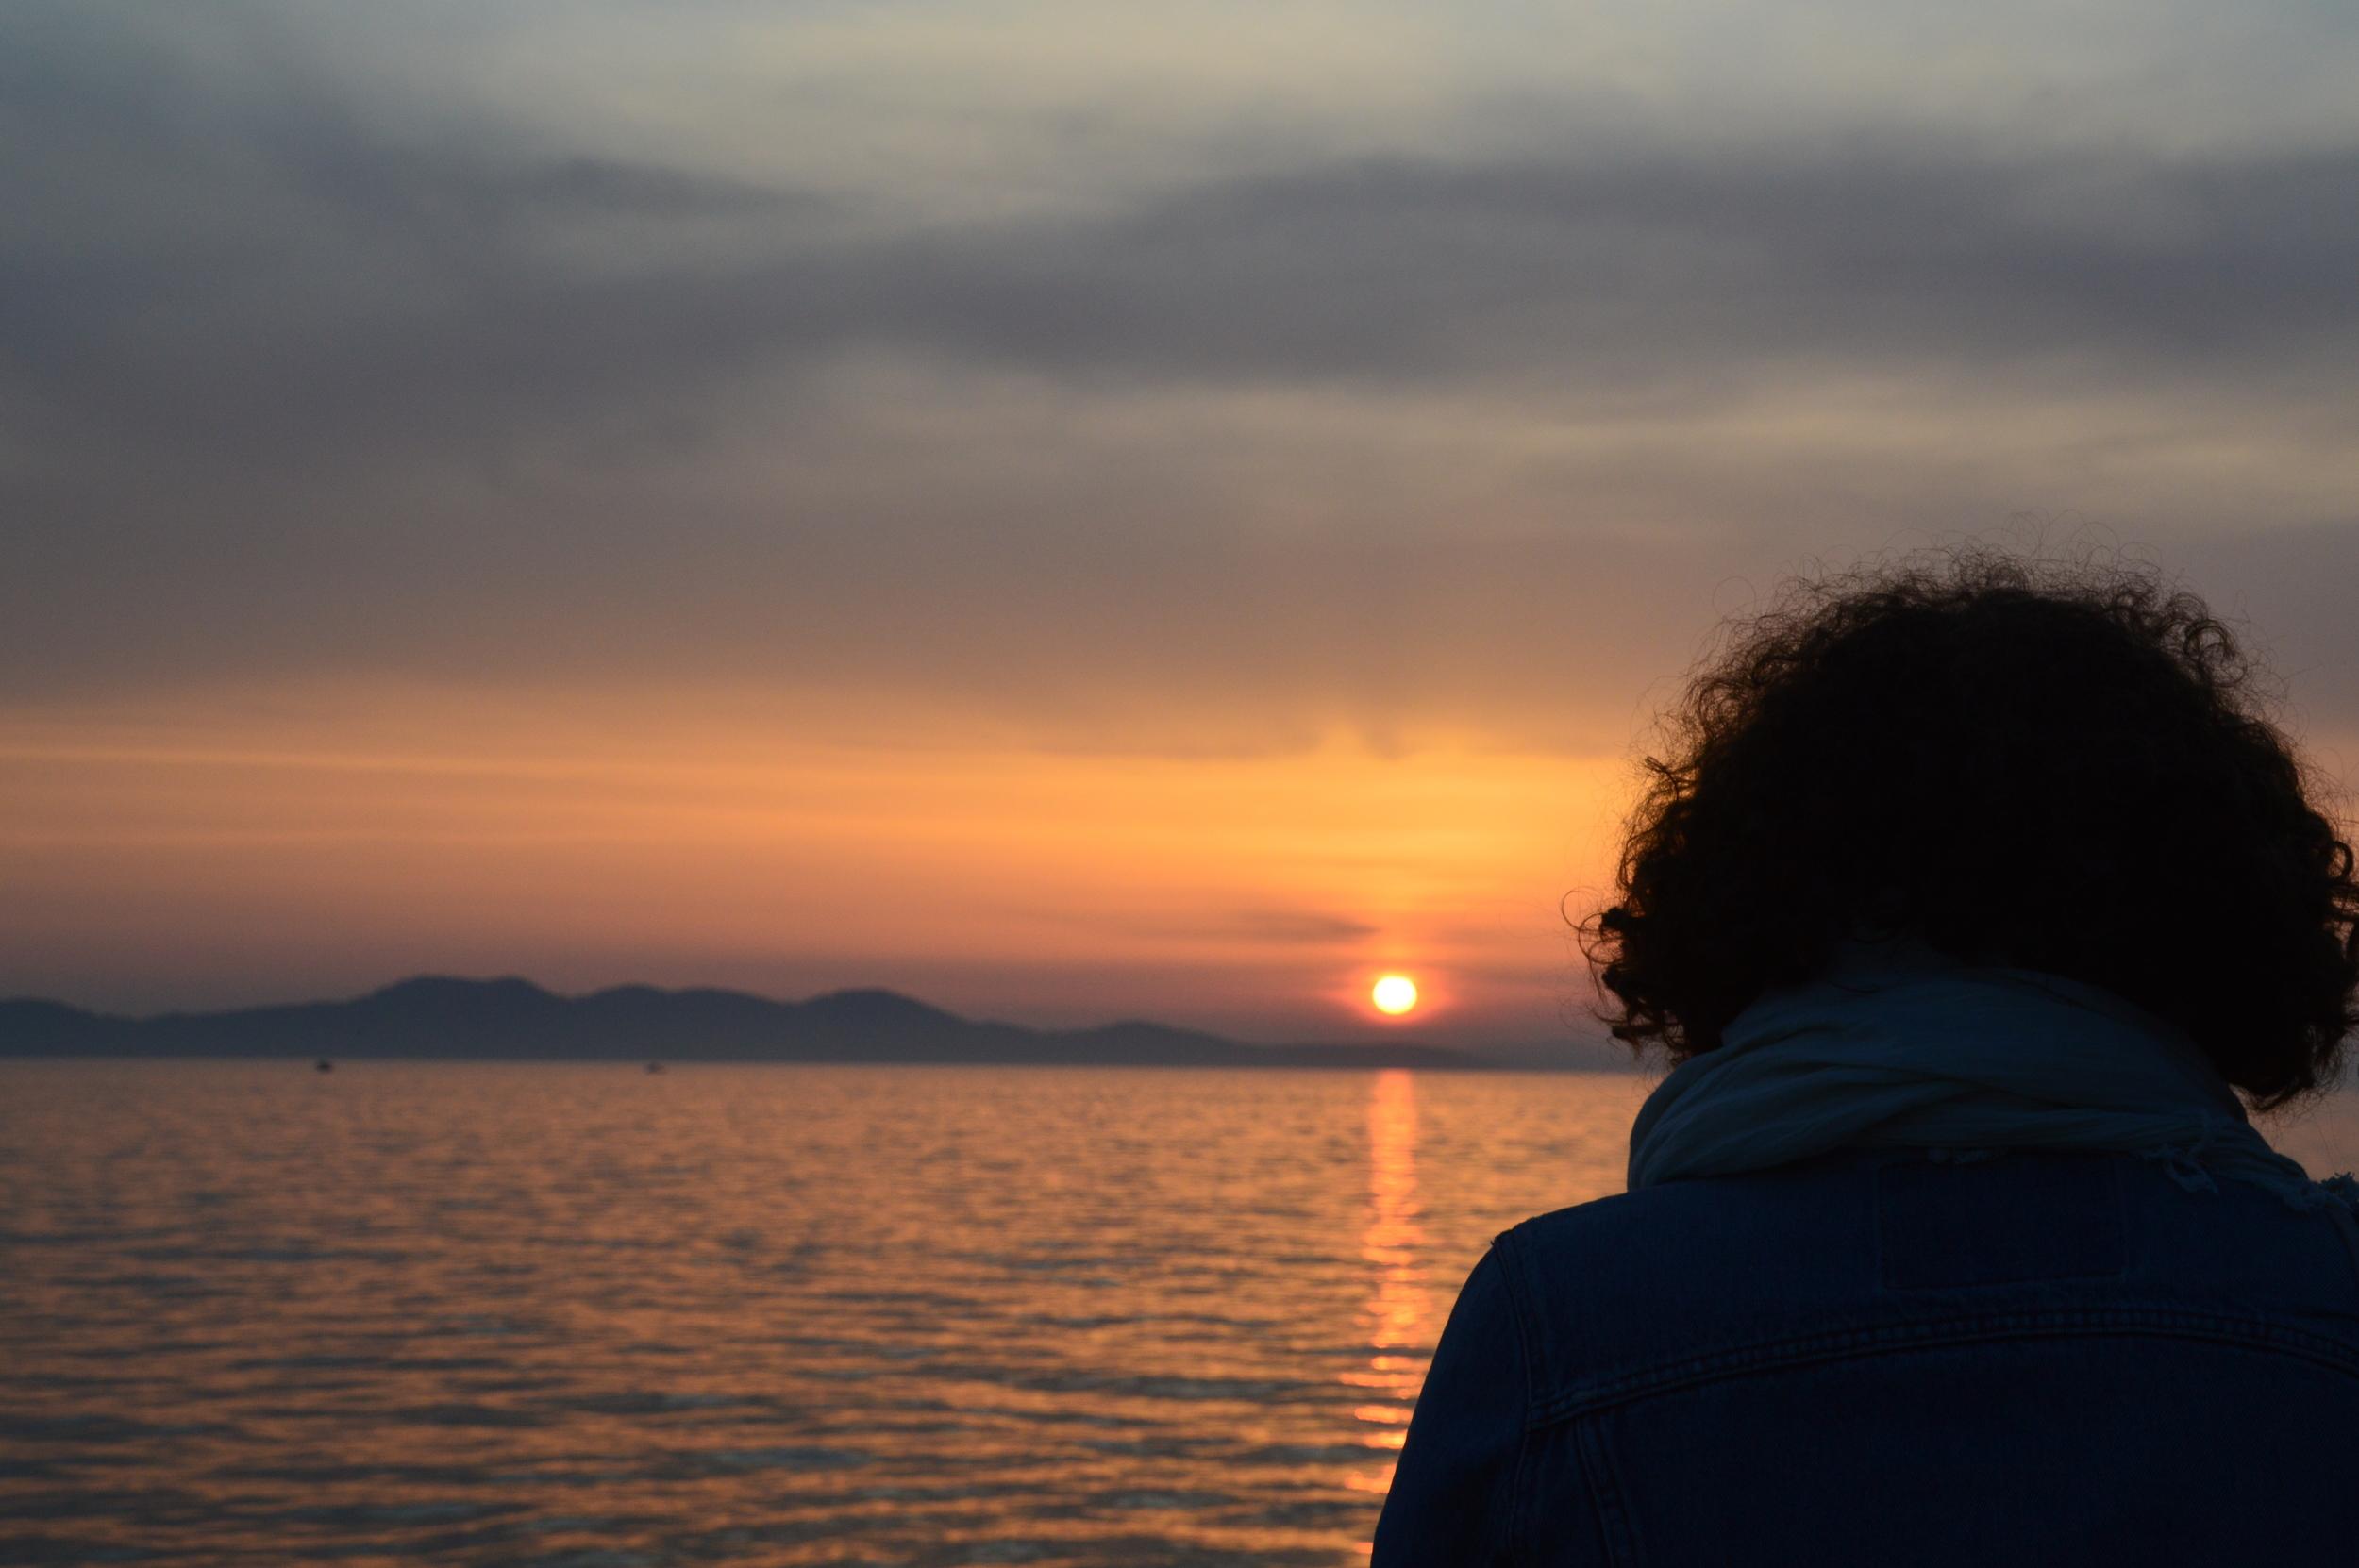 Beautiful sunset in Croatia. Budget travel in Zadar, Croatia.